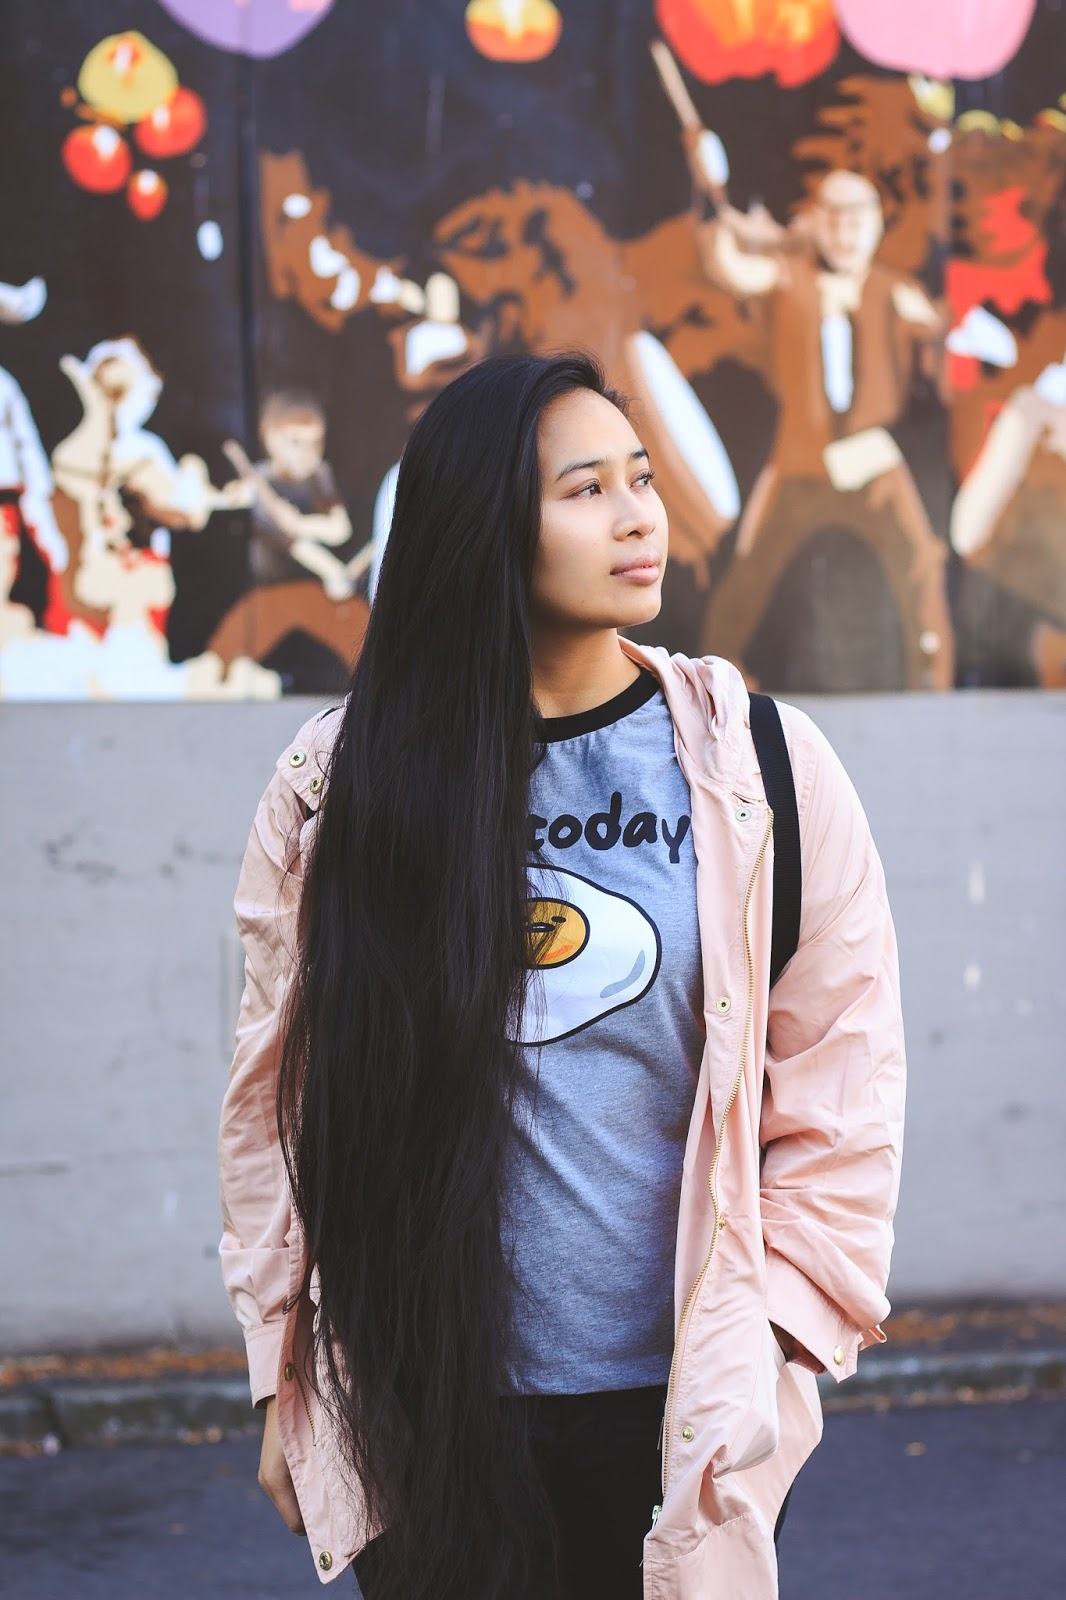 seattle blogger ootd chinatown sanrio nylon forever 21 gudetama